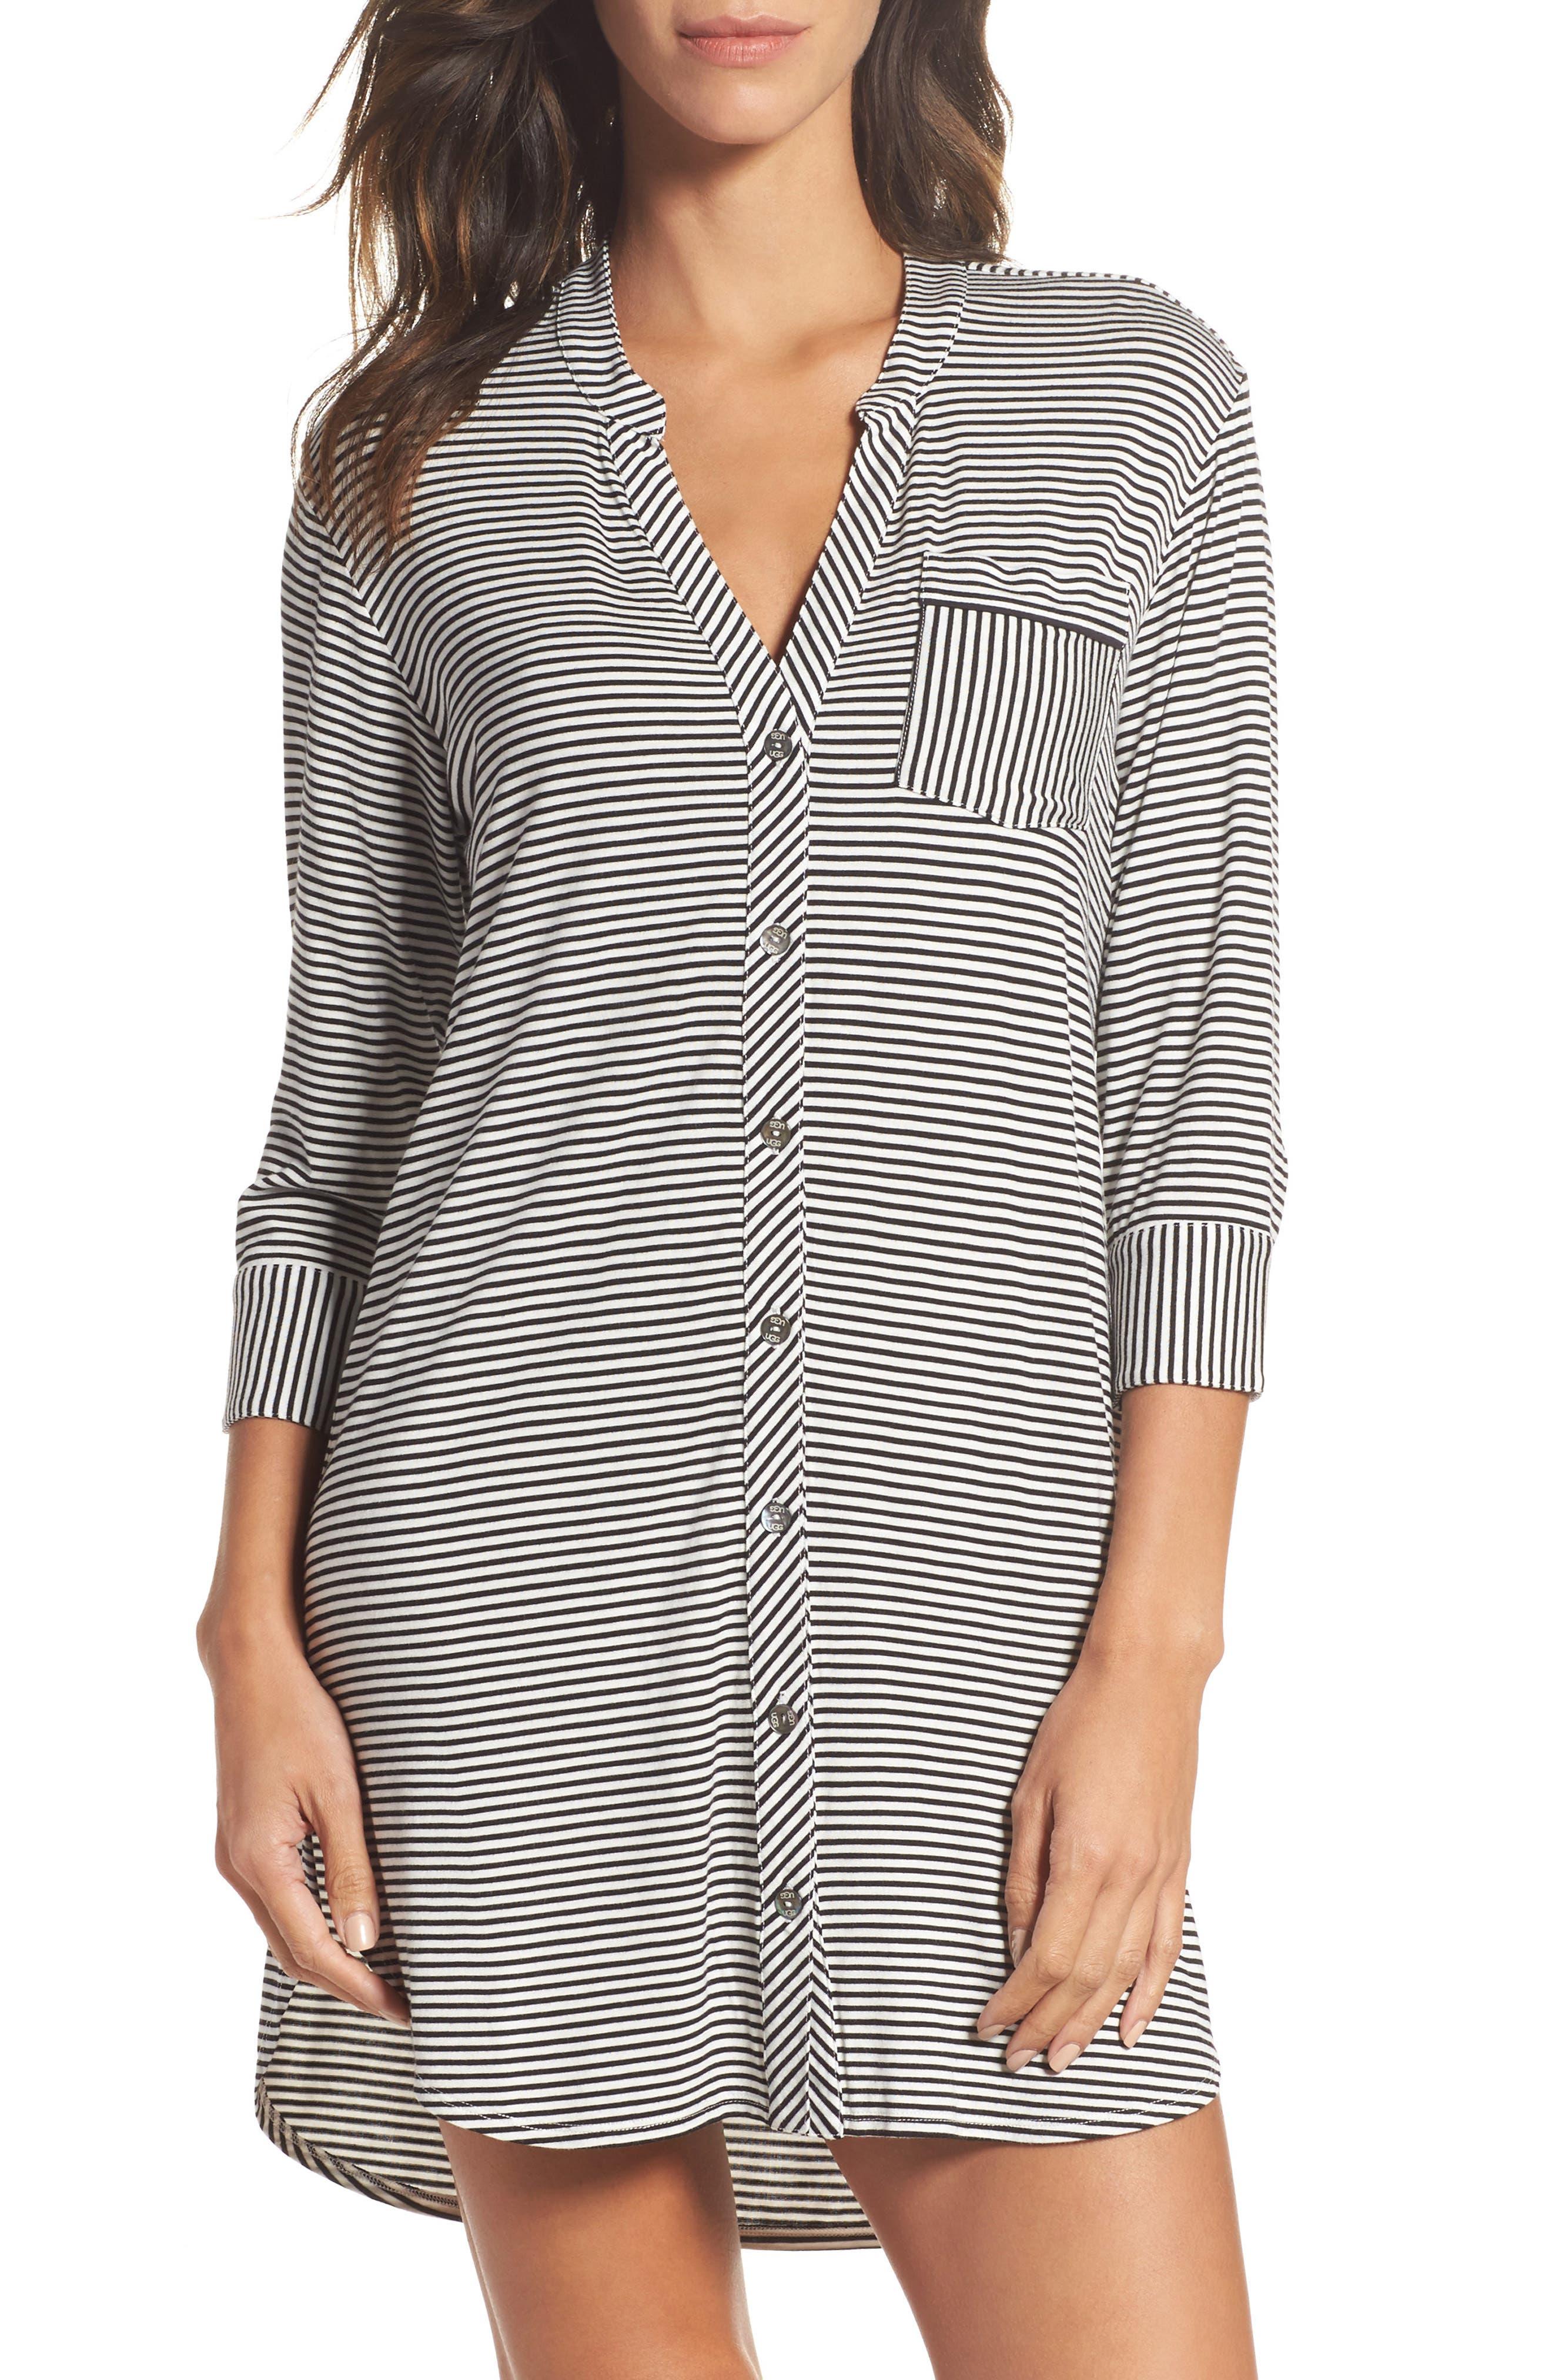 Alternate Image 1 Selected - UGG® Vivian Sleep Shirt